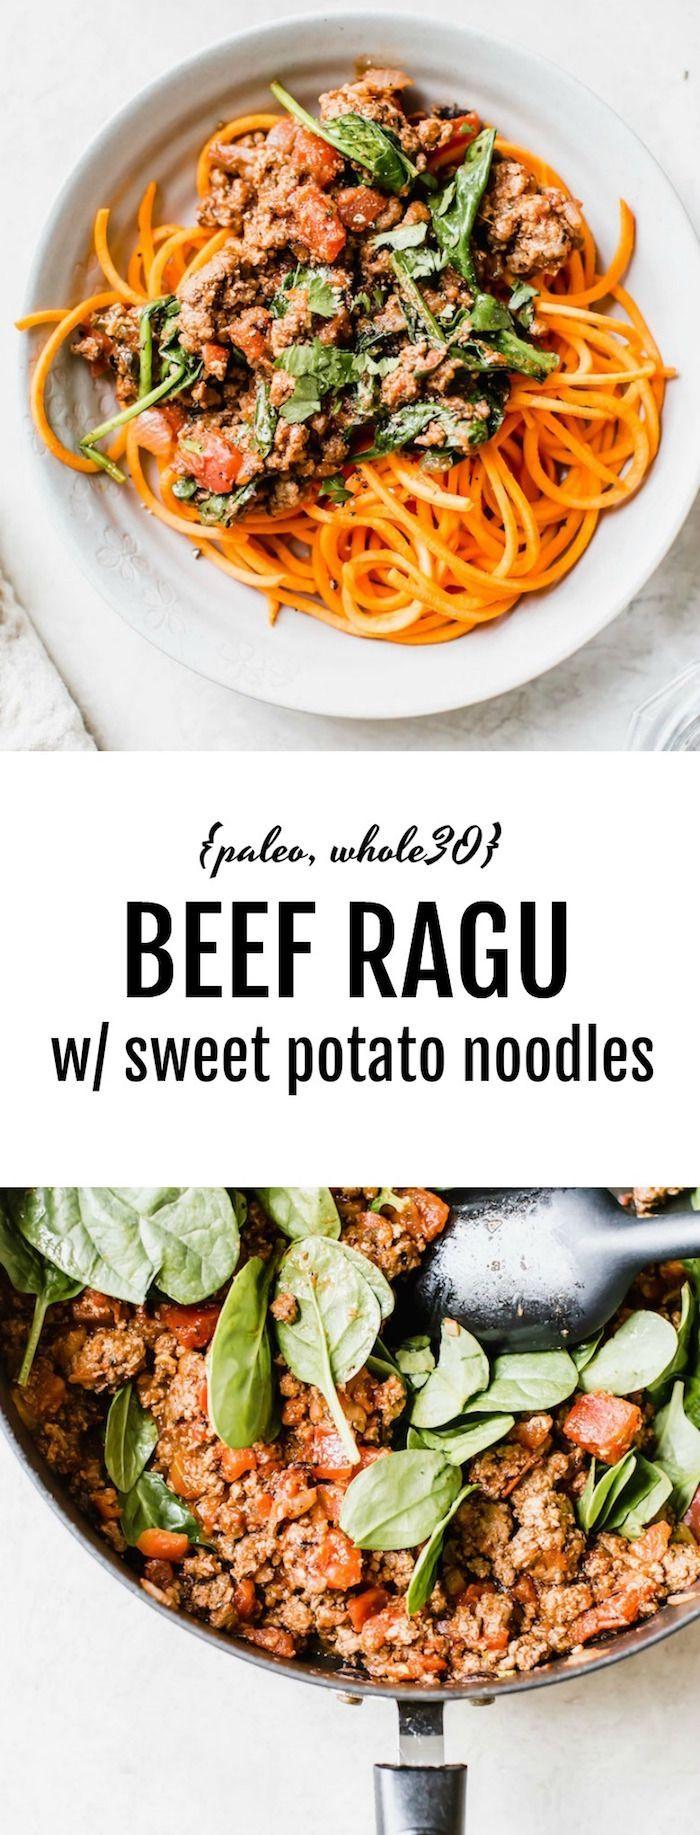 Beef Ragu with Sweet Potato Noodles (paleo, whole30) images